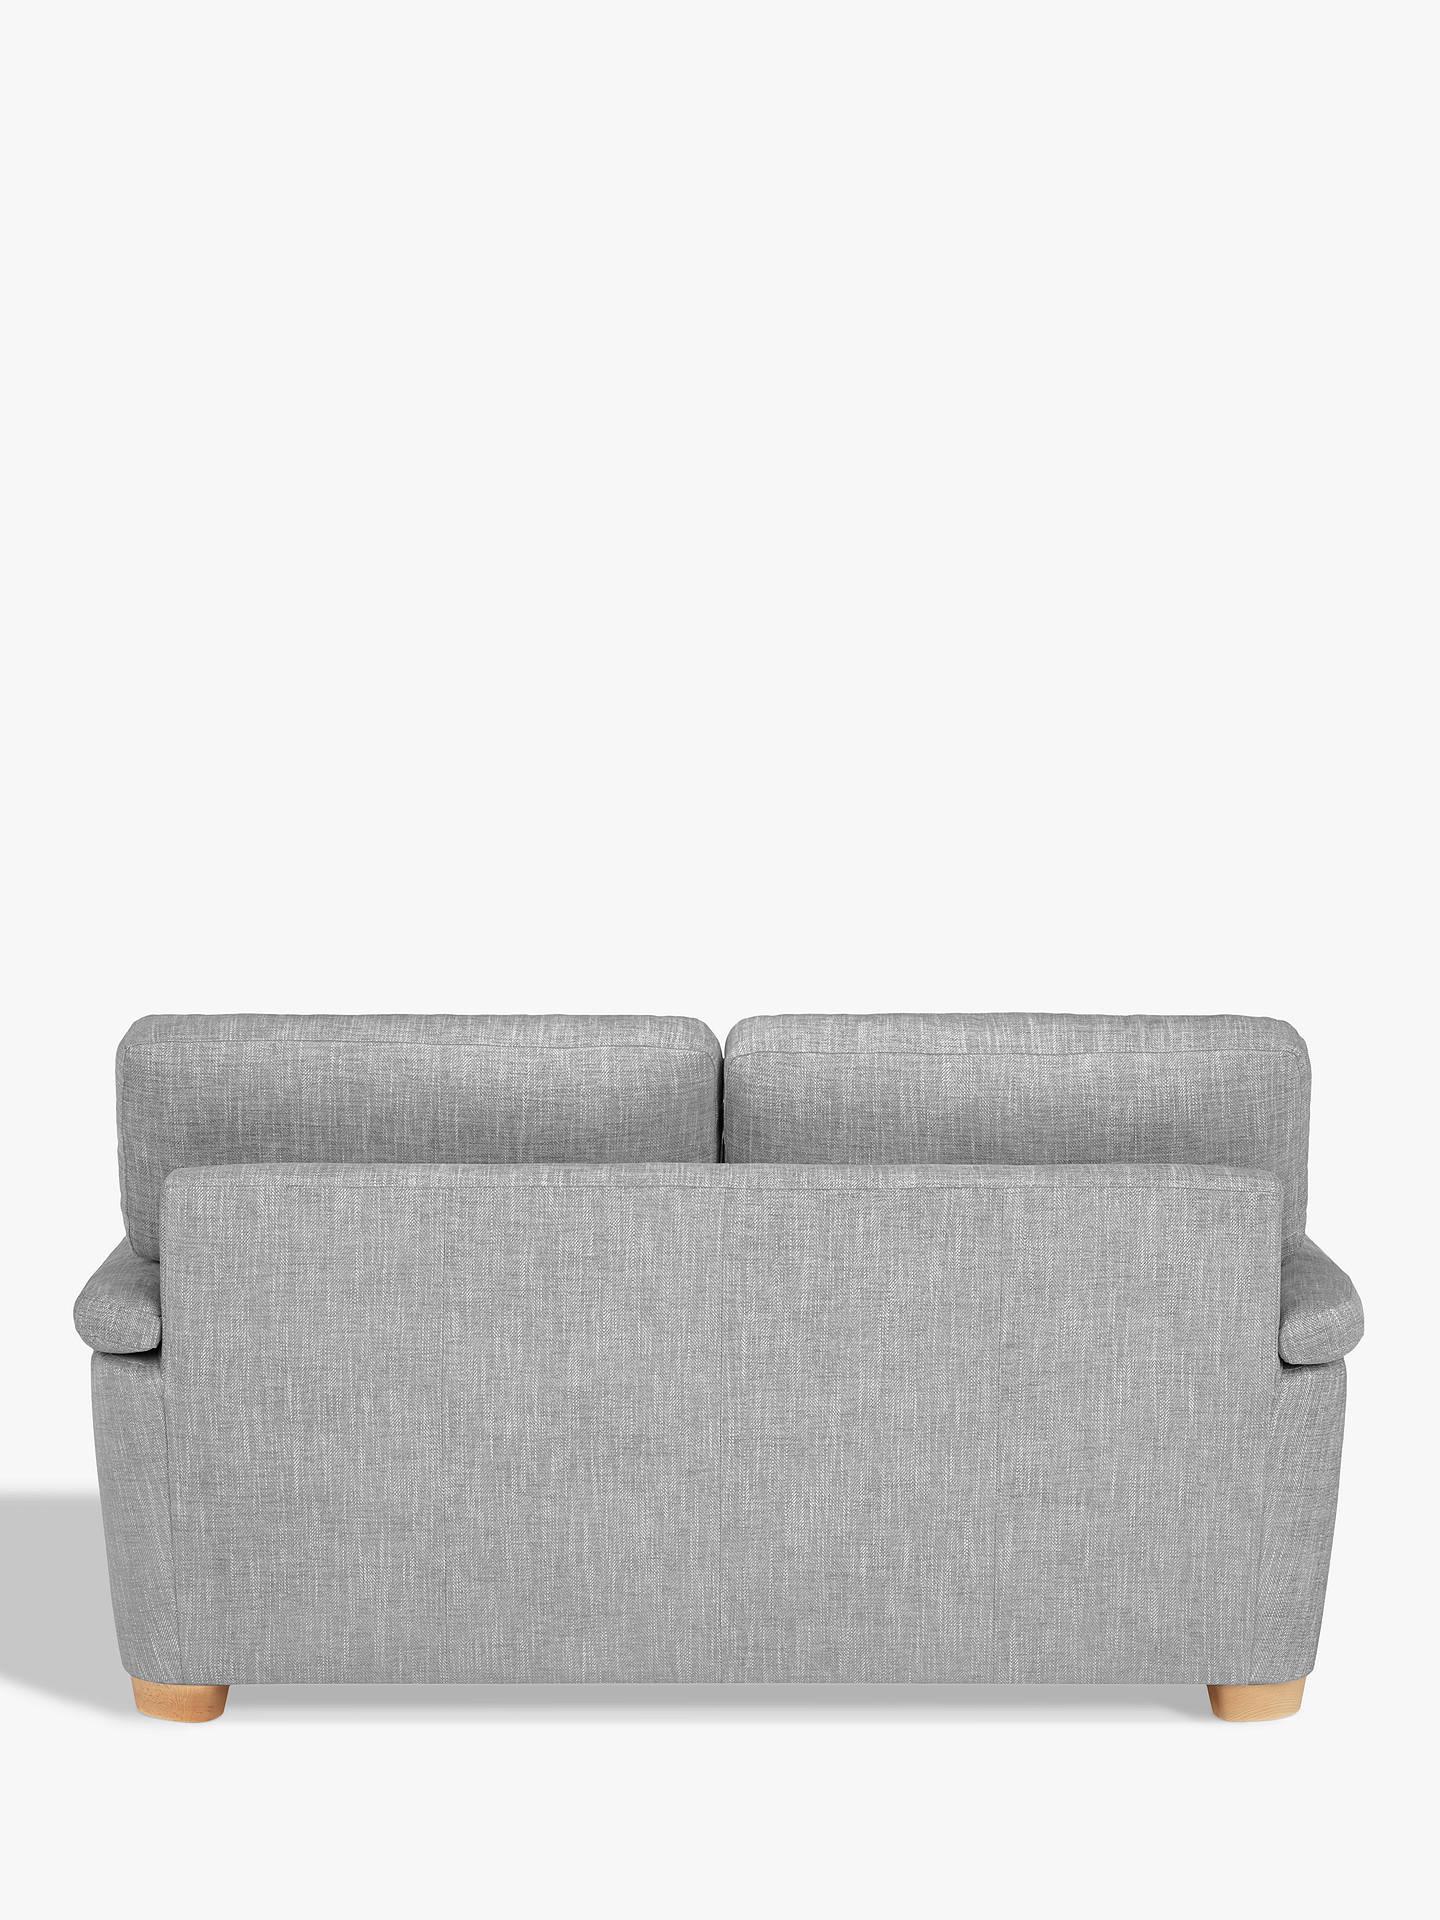 John Lewis Partners Camden Medium 2 Seater Sofa At John Lewis